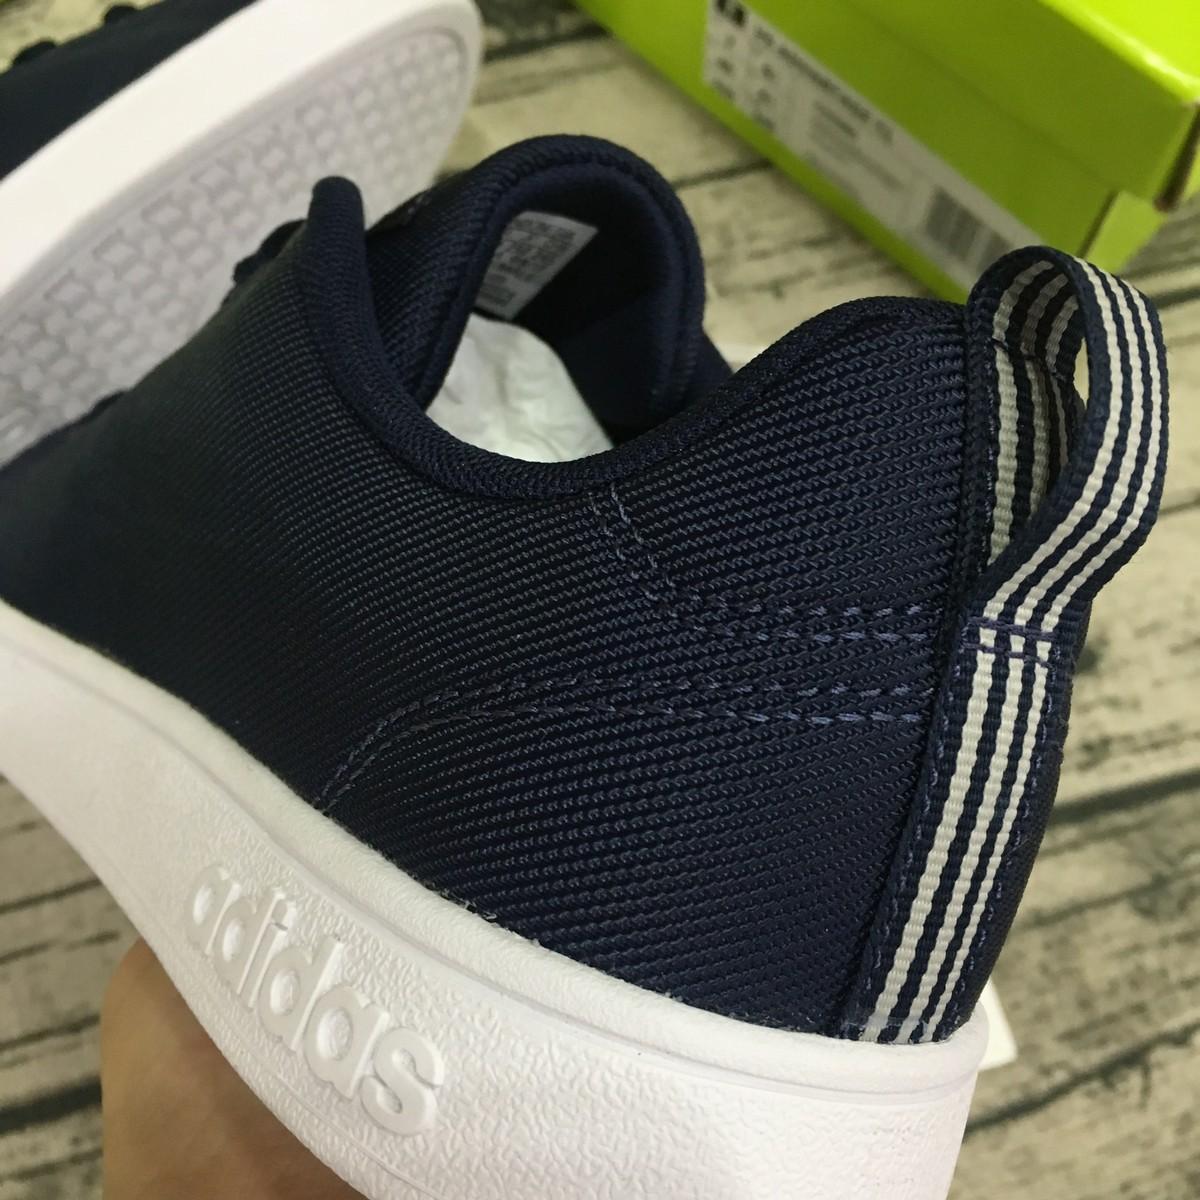 Giầy Adidas Neo Advantage Blue Nam CG5686